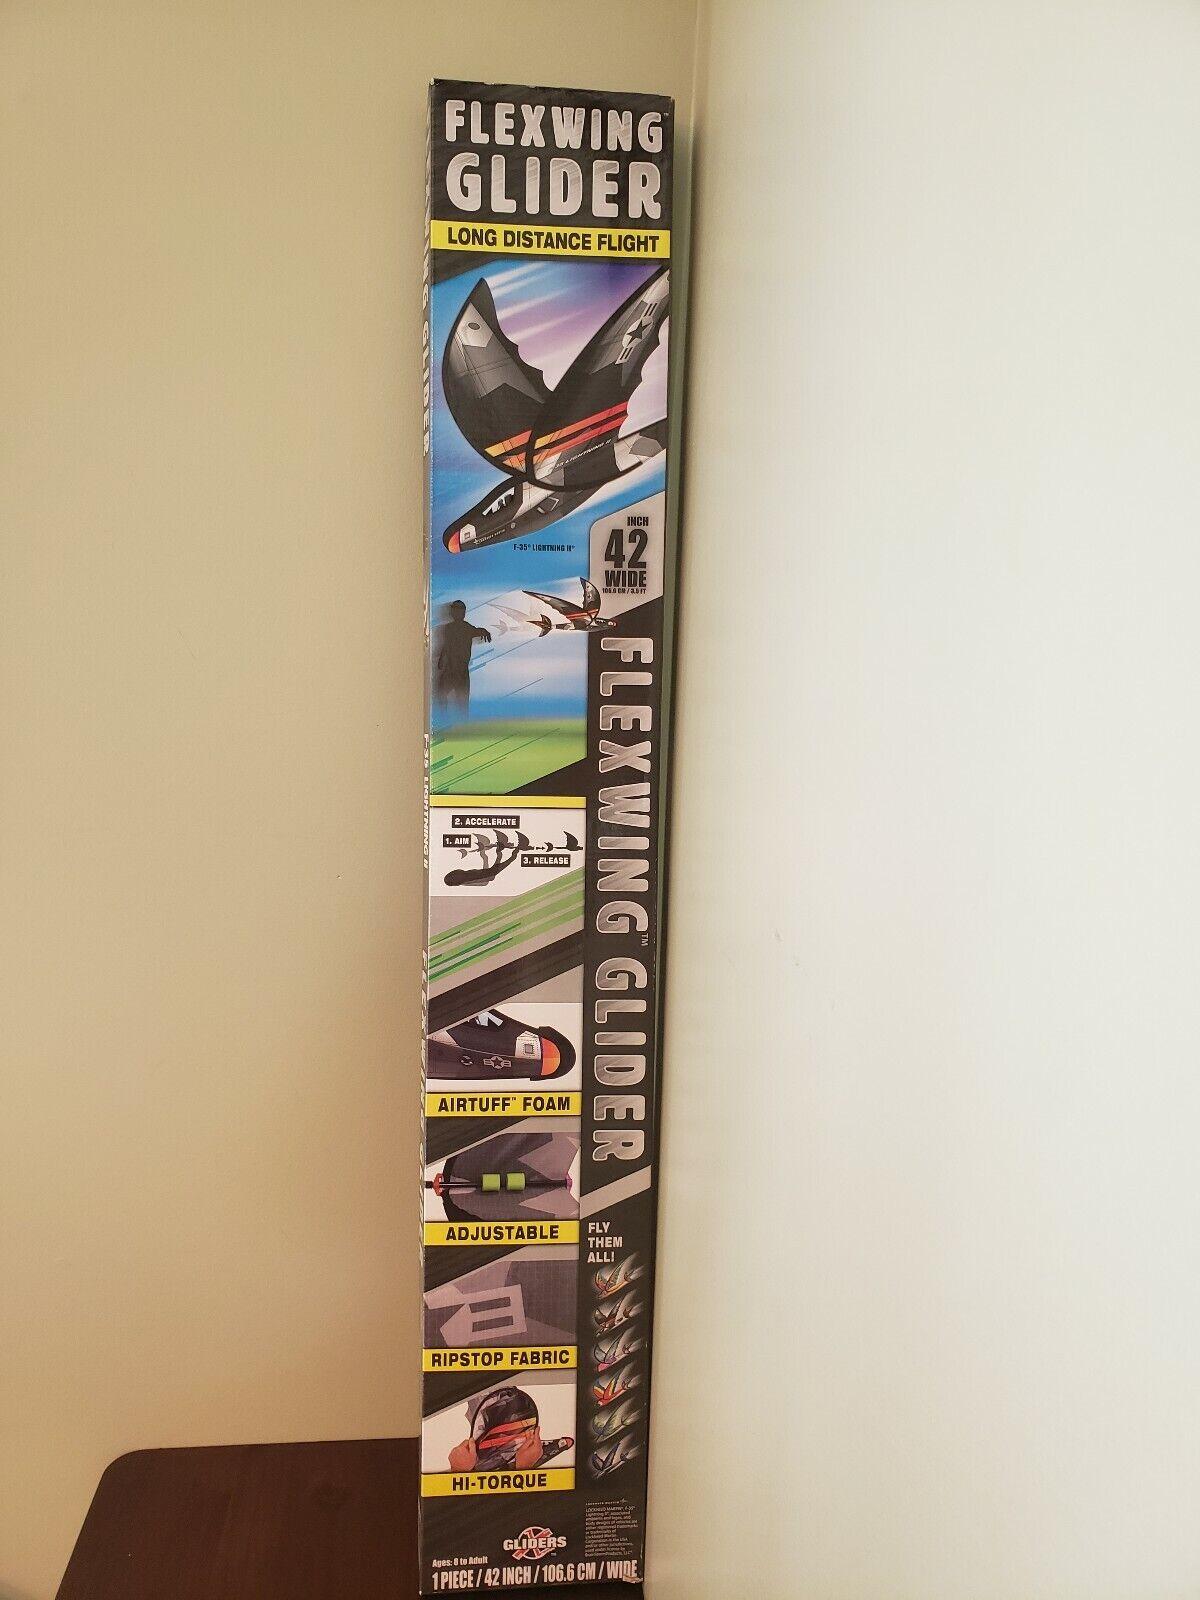 flexwing glider long distance flight size 42